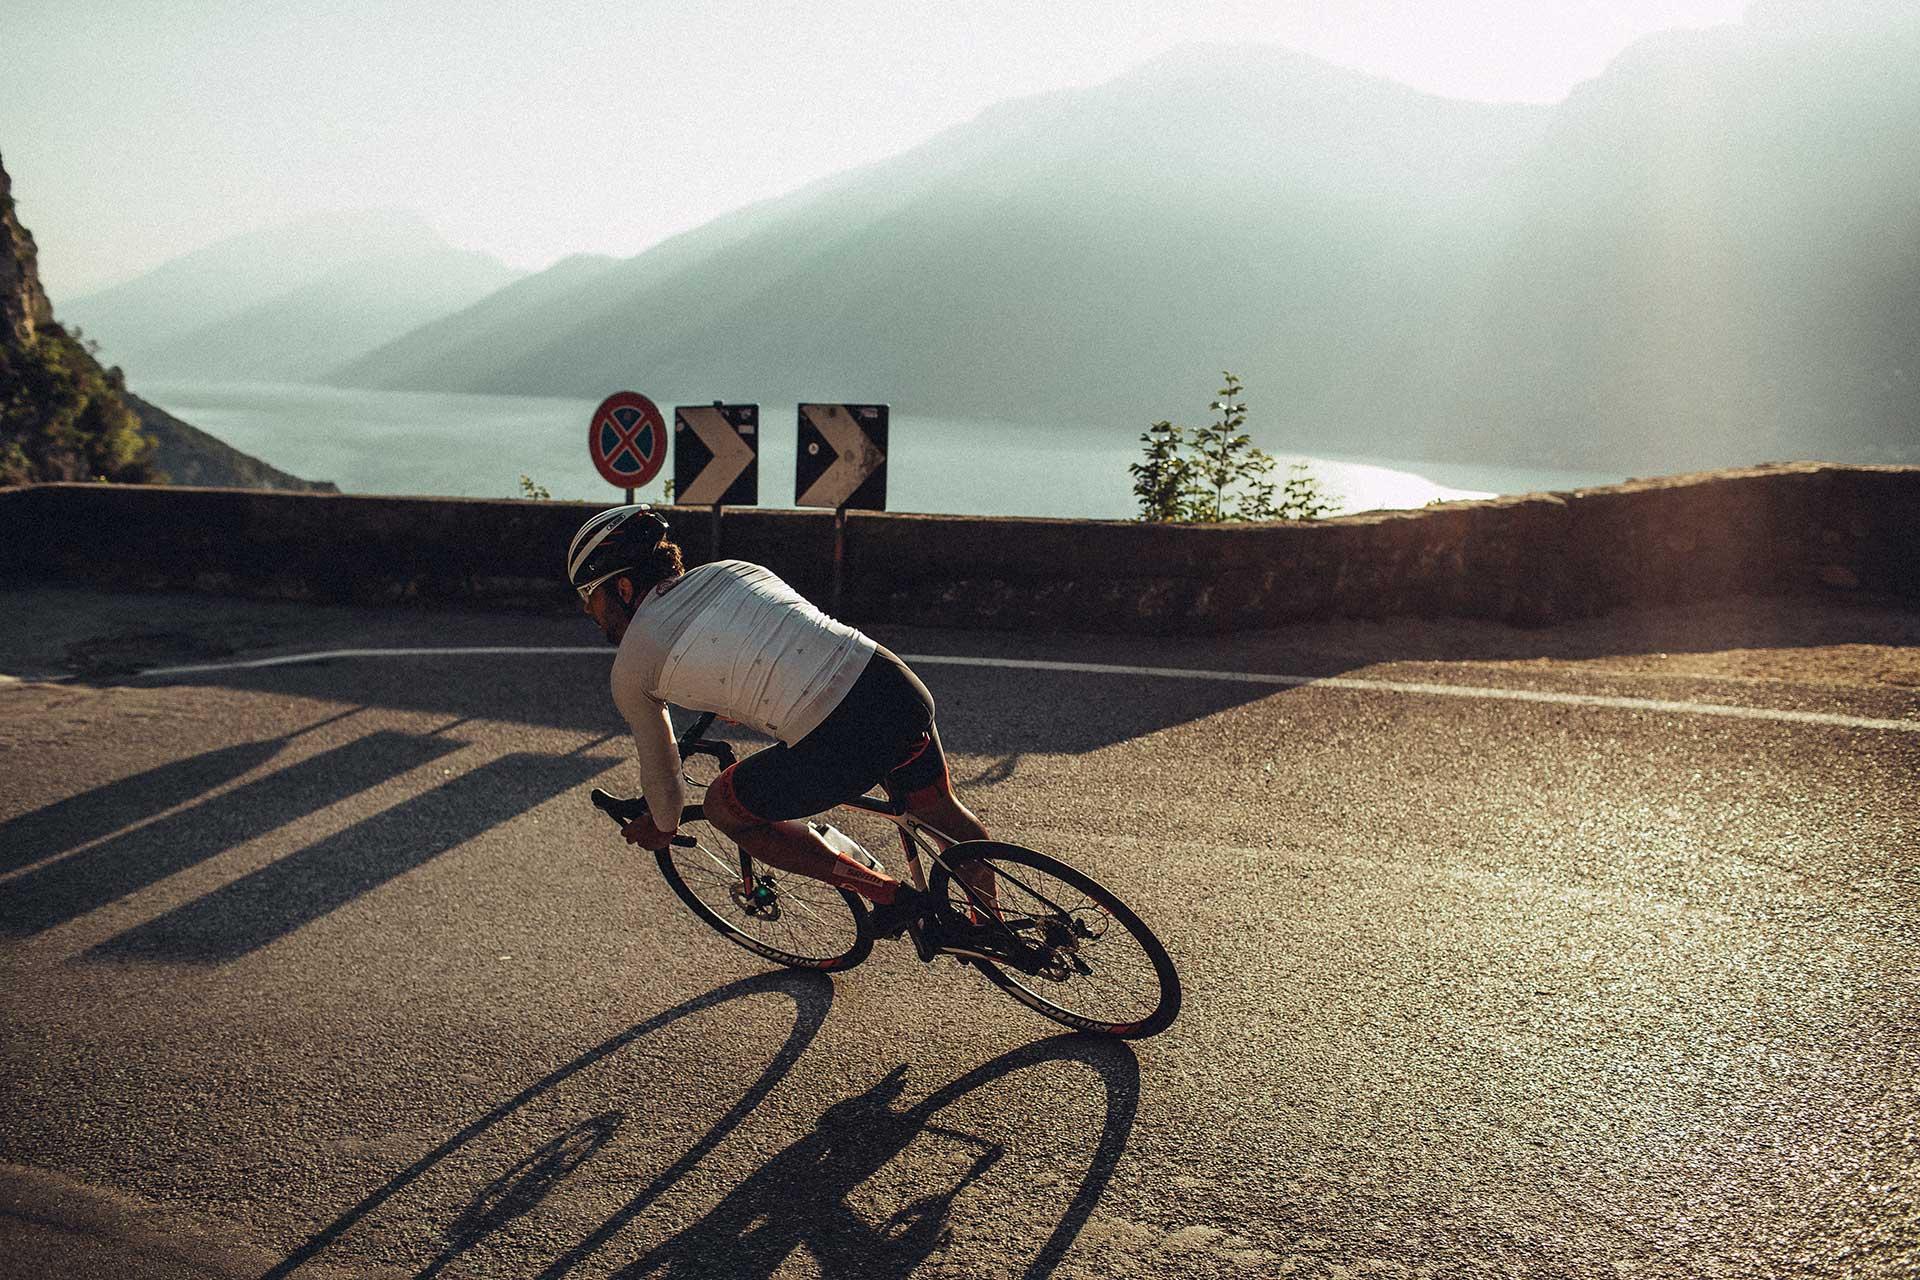 Berge Fotoproduktion Helm Abus Katalog Kampagne Rennrad Sport Berlin